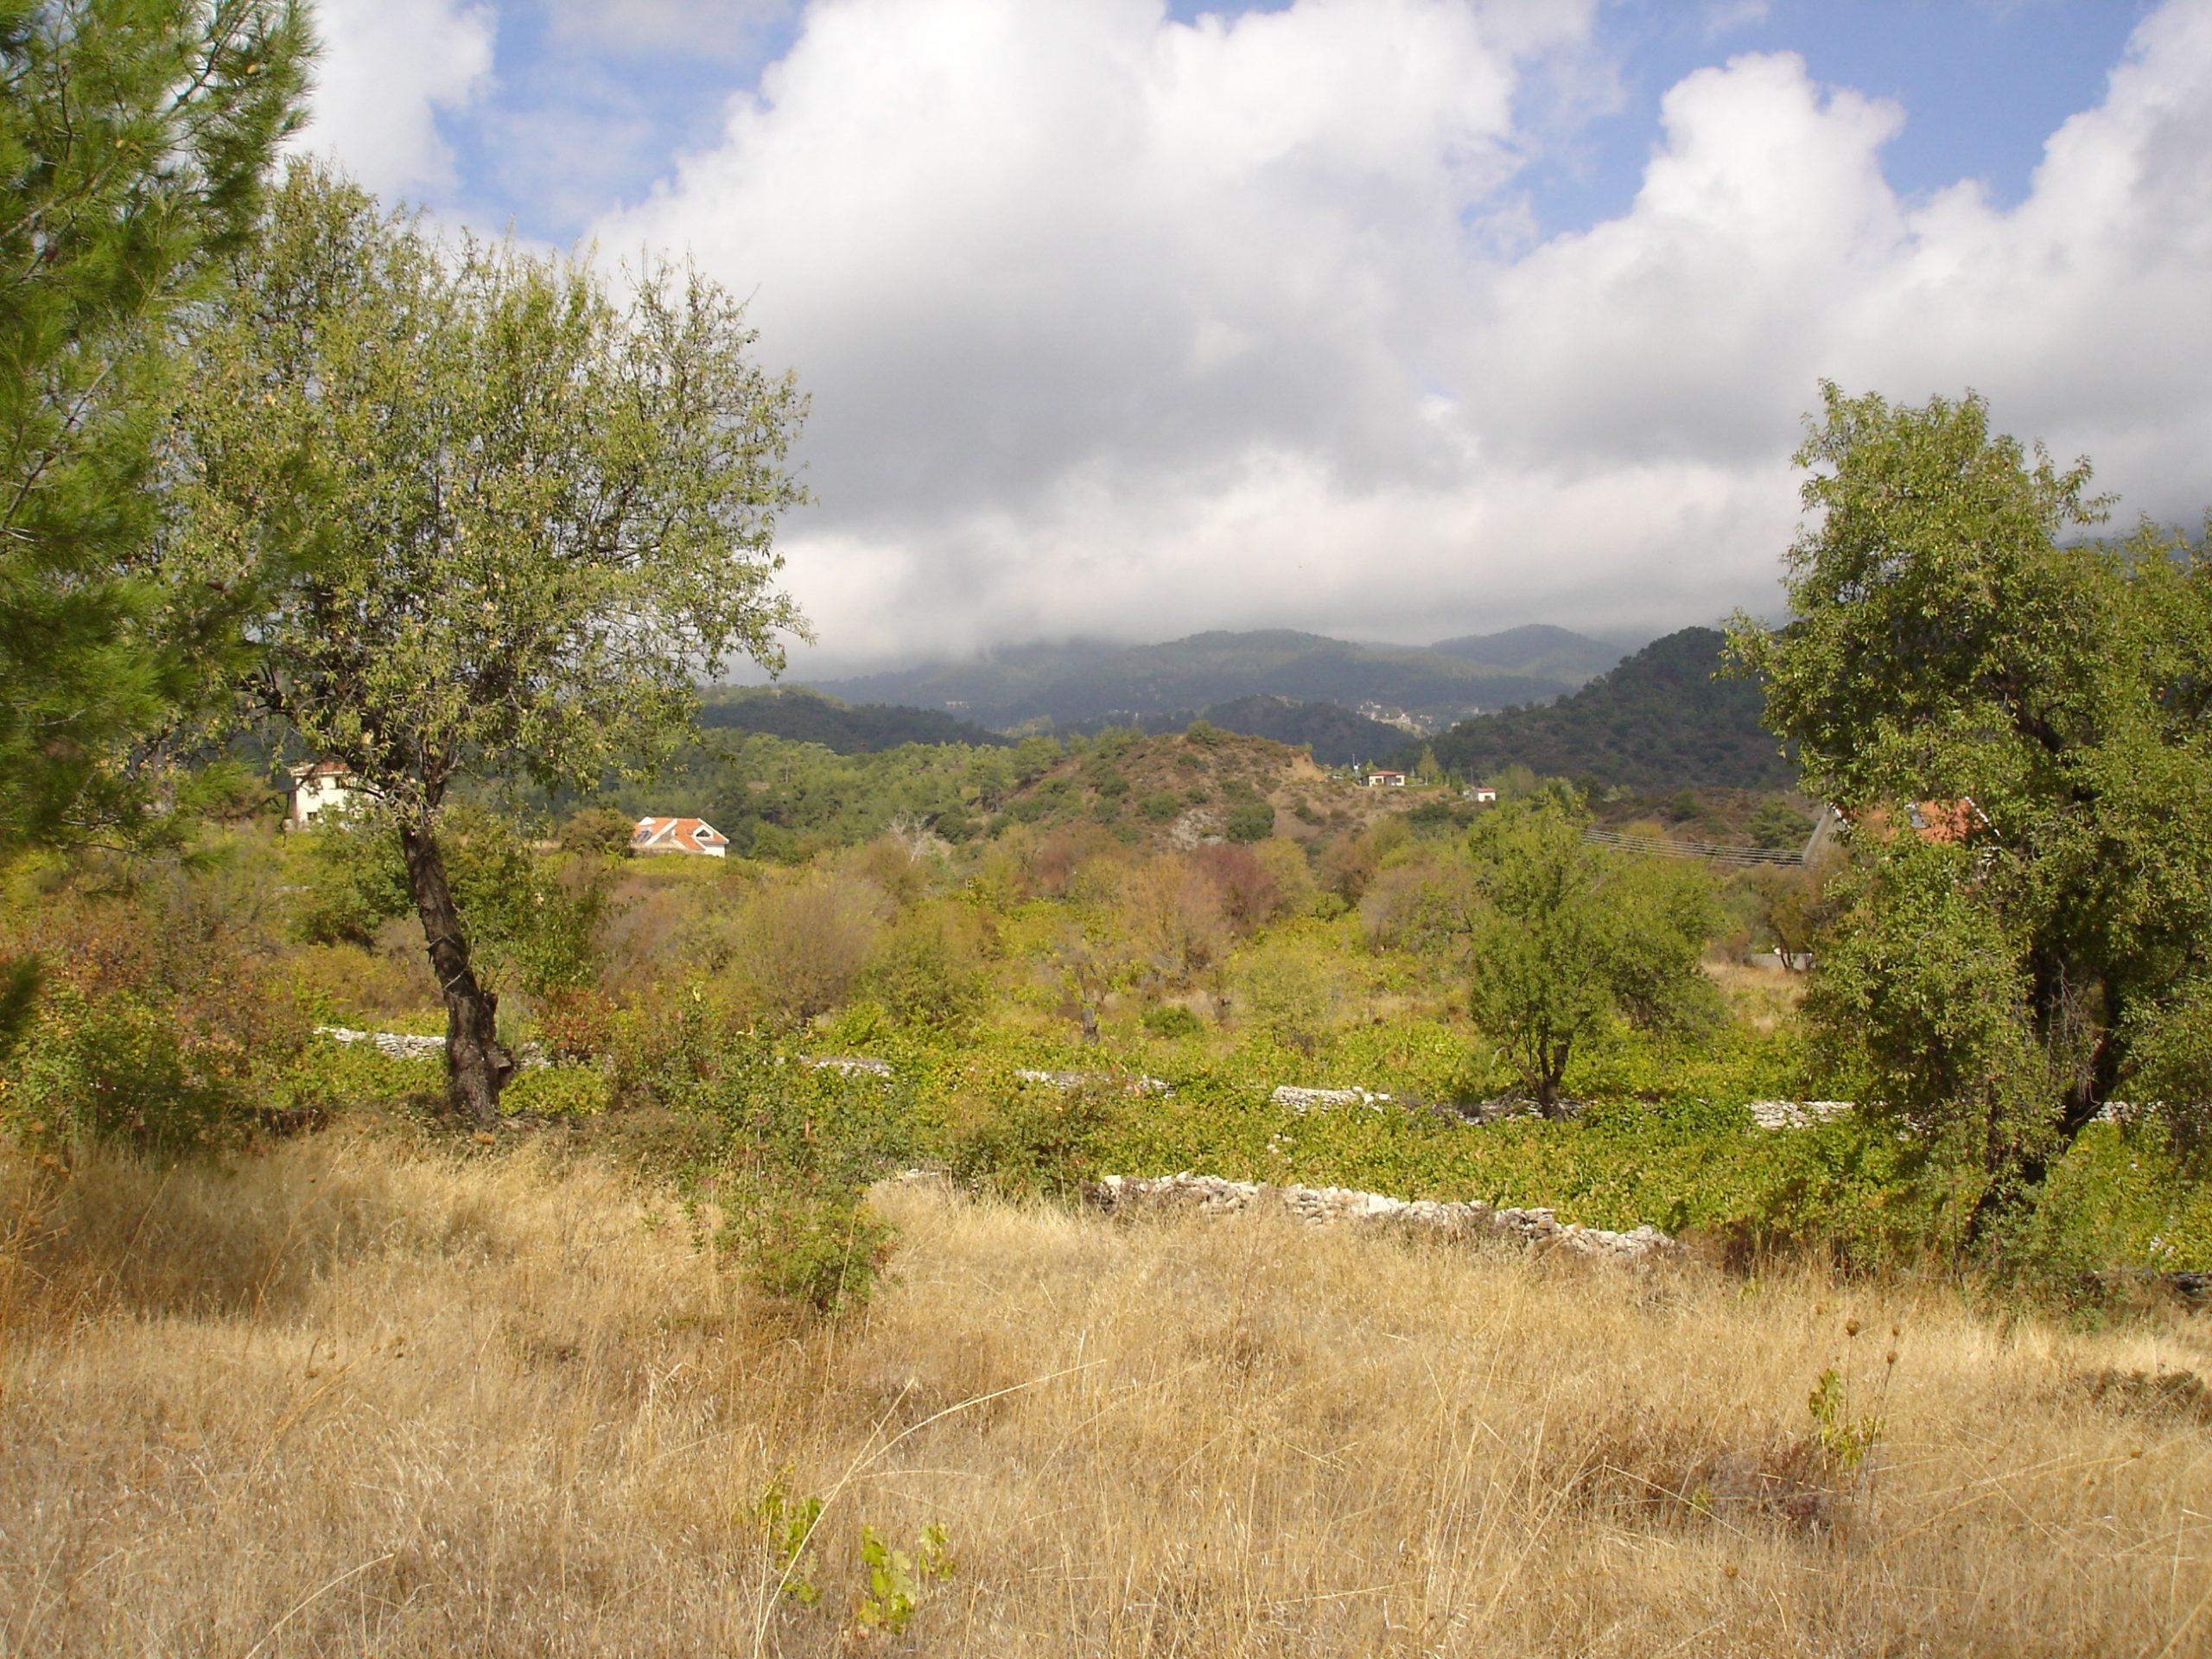 Residential piece of land in Pera Pedi village